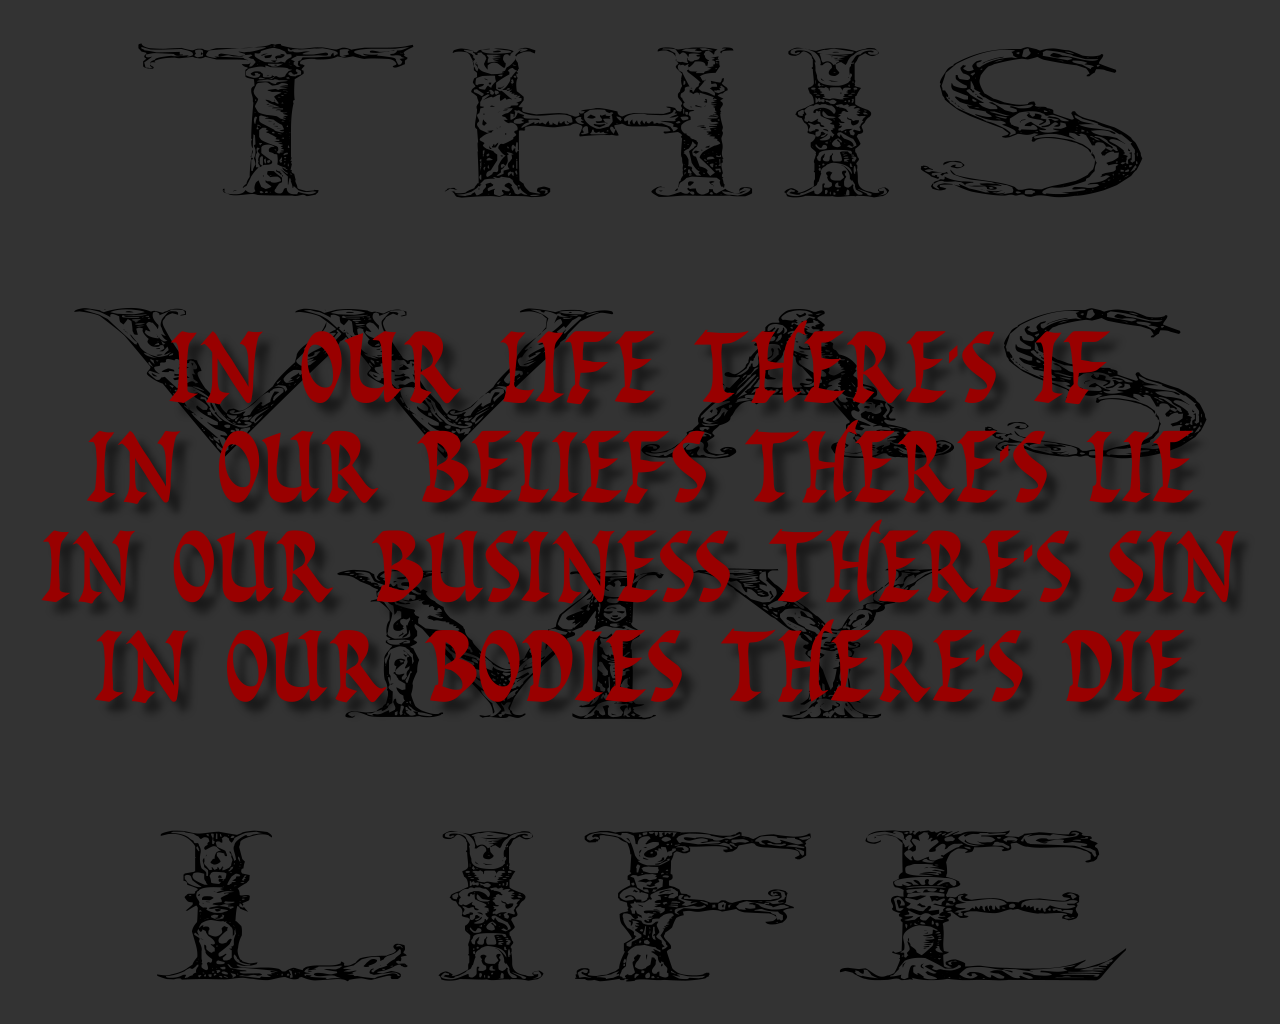 http://2.bp.blogspot.com/-LR3Gb4pdbHI/TaubHAAZGeI/AAAAAAAAAI0/-lPvdX-VgeY/s1600/This_Was_My_Life_Megadeth_Song_Lyric_Quote_in_Text_Image_1280x1024_Pixels.png